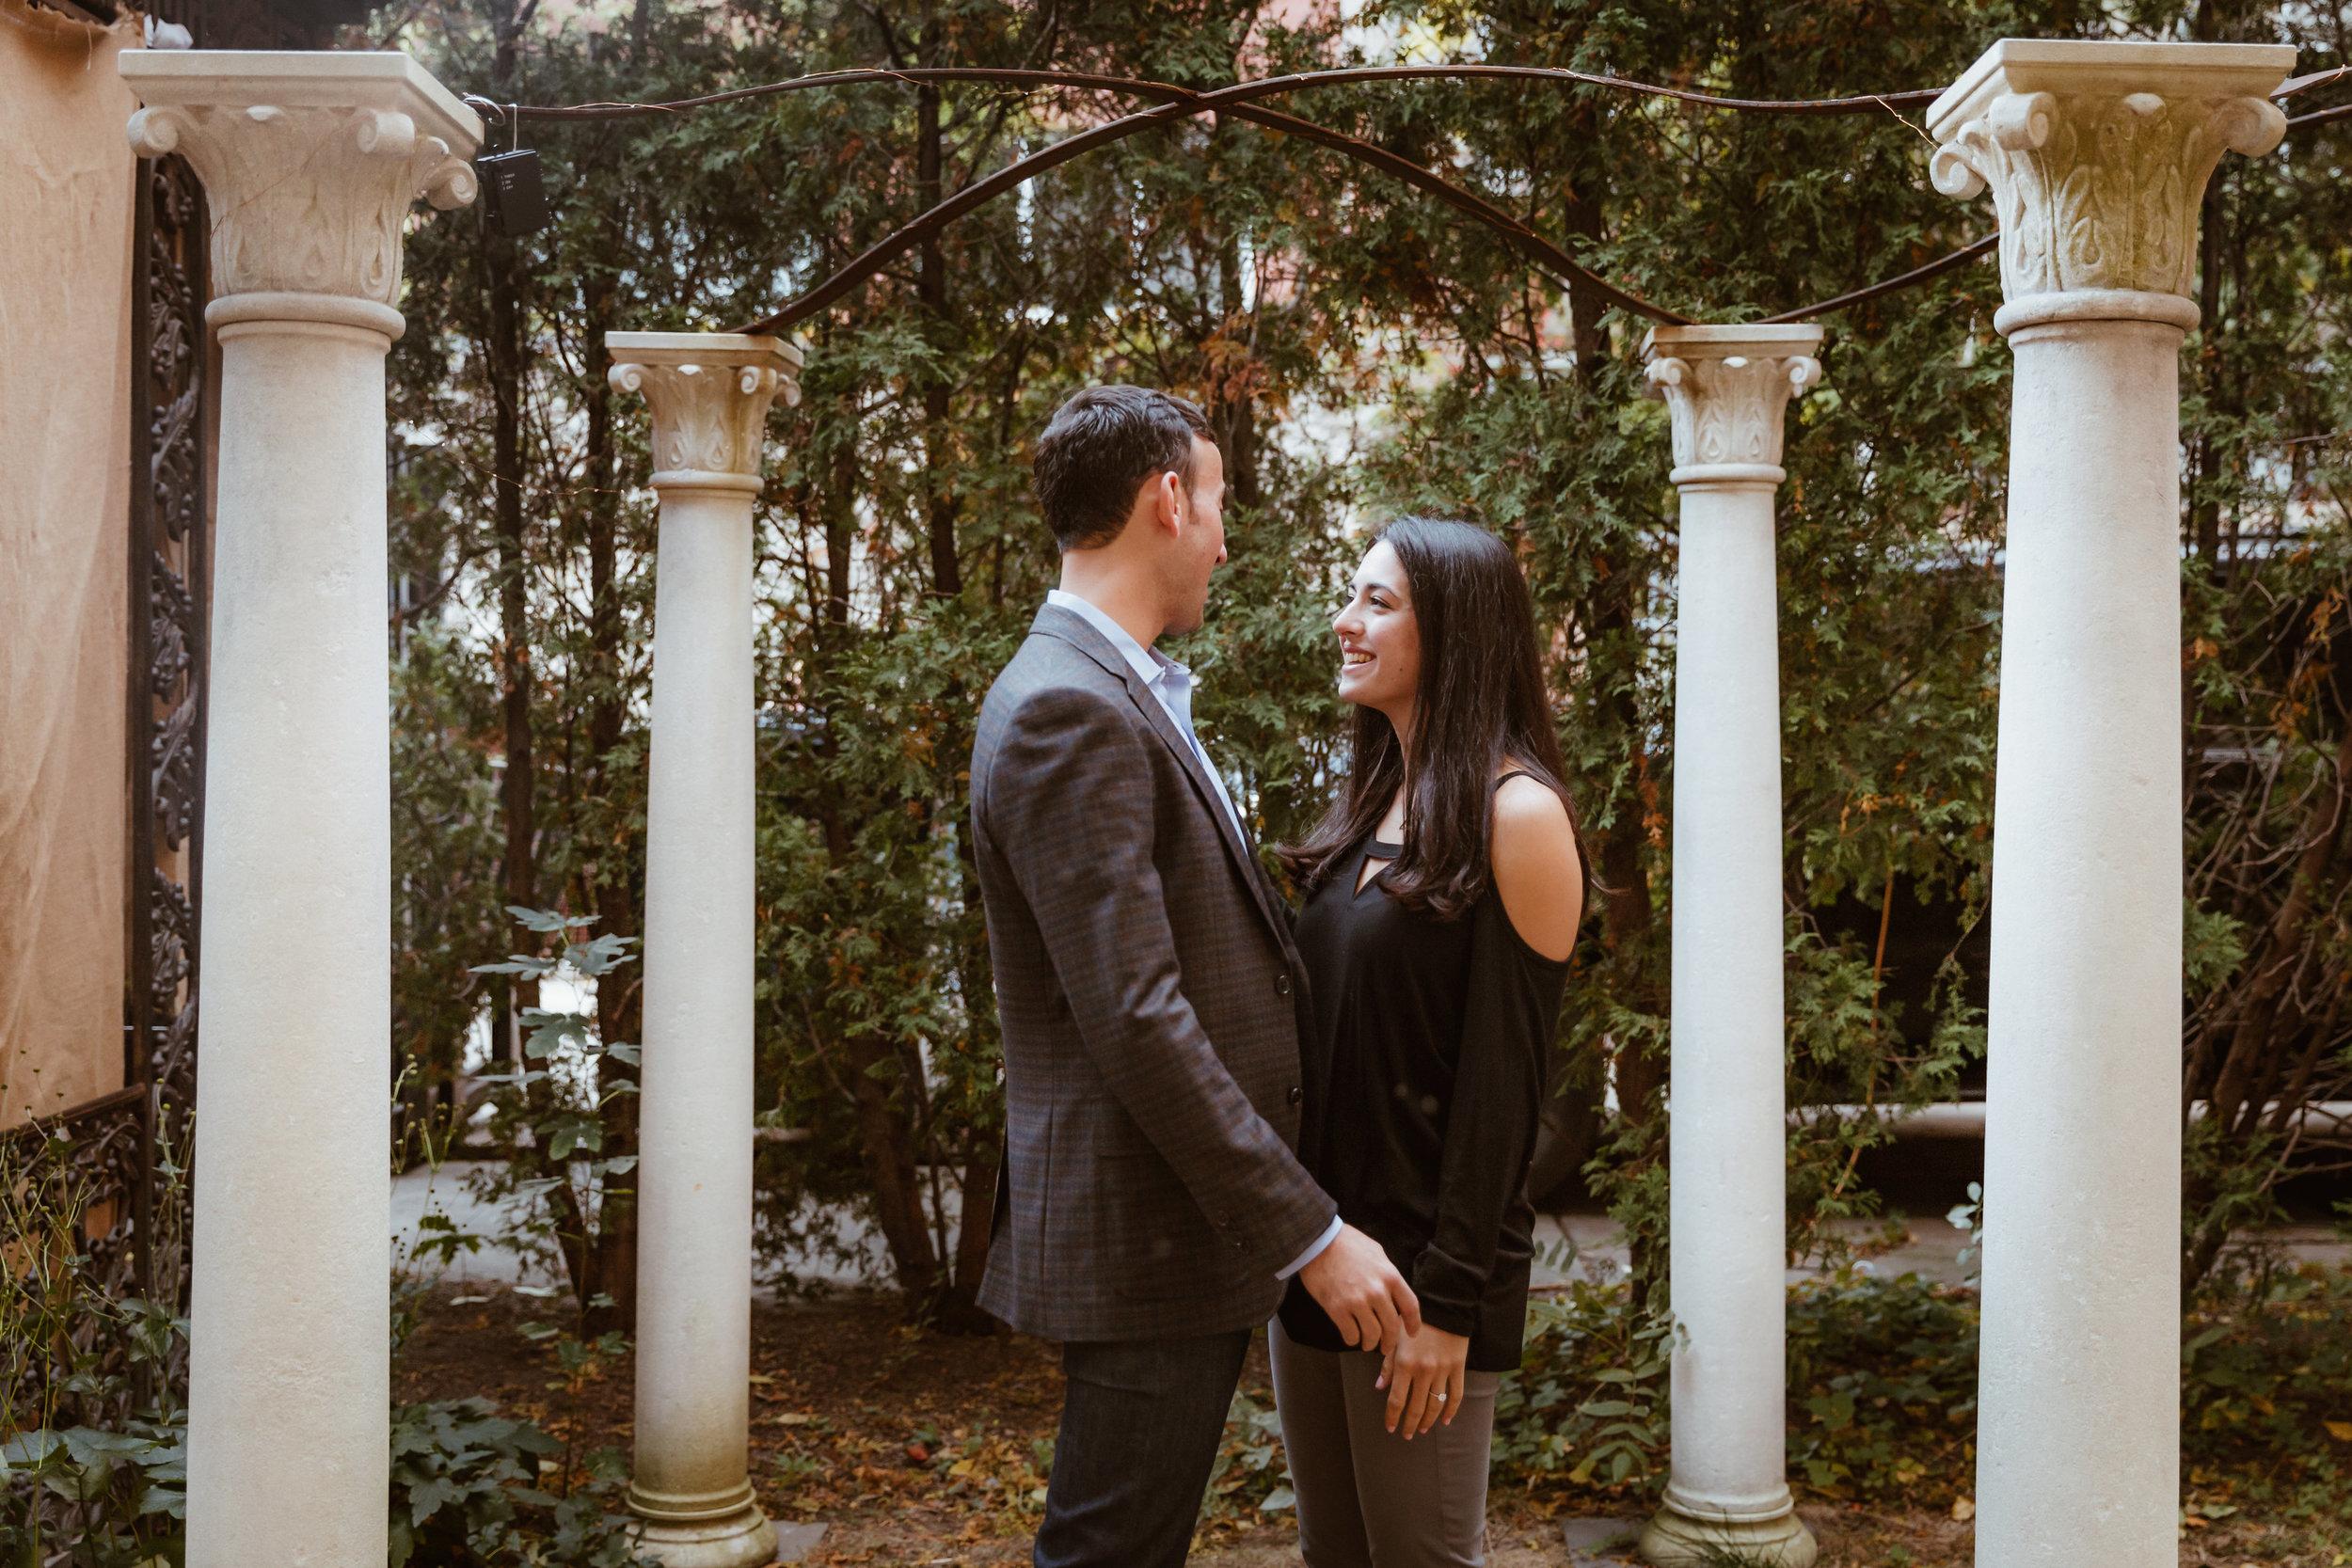 Proposal at Elizabeth Street Garden in New York by Unveiled-Weddings.com